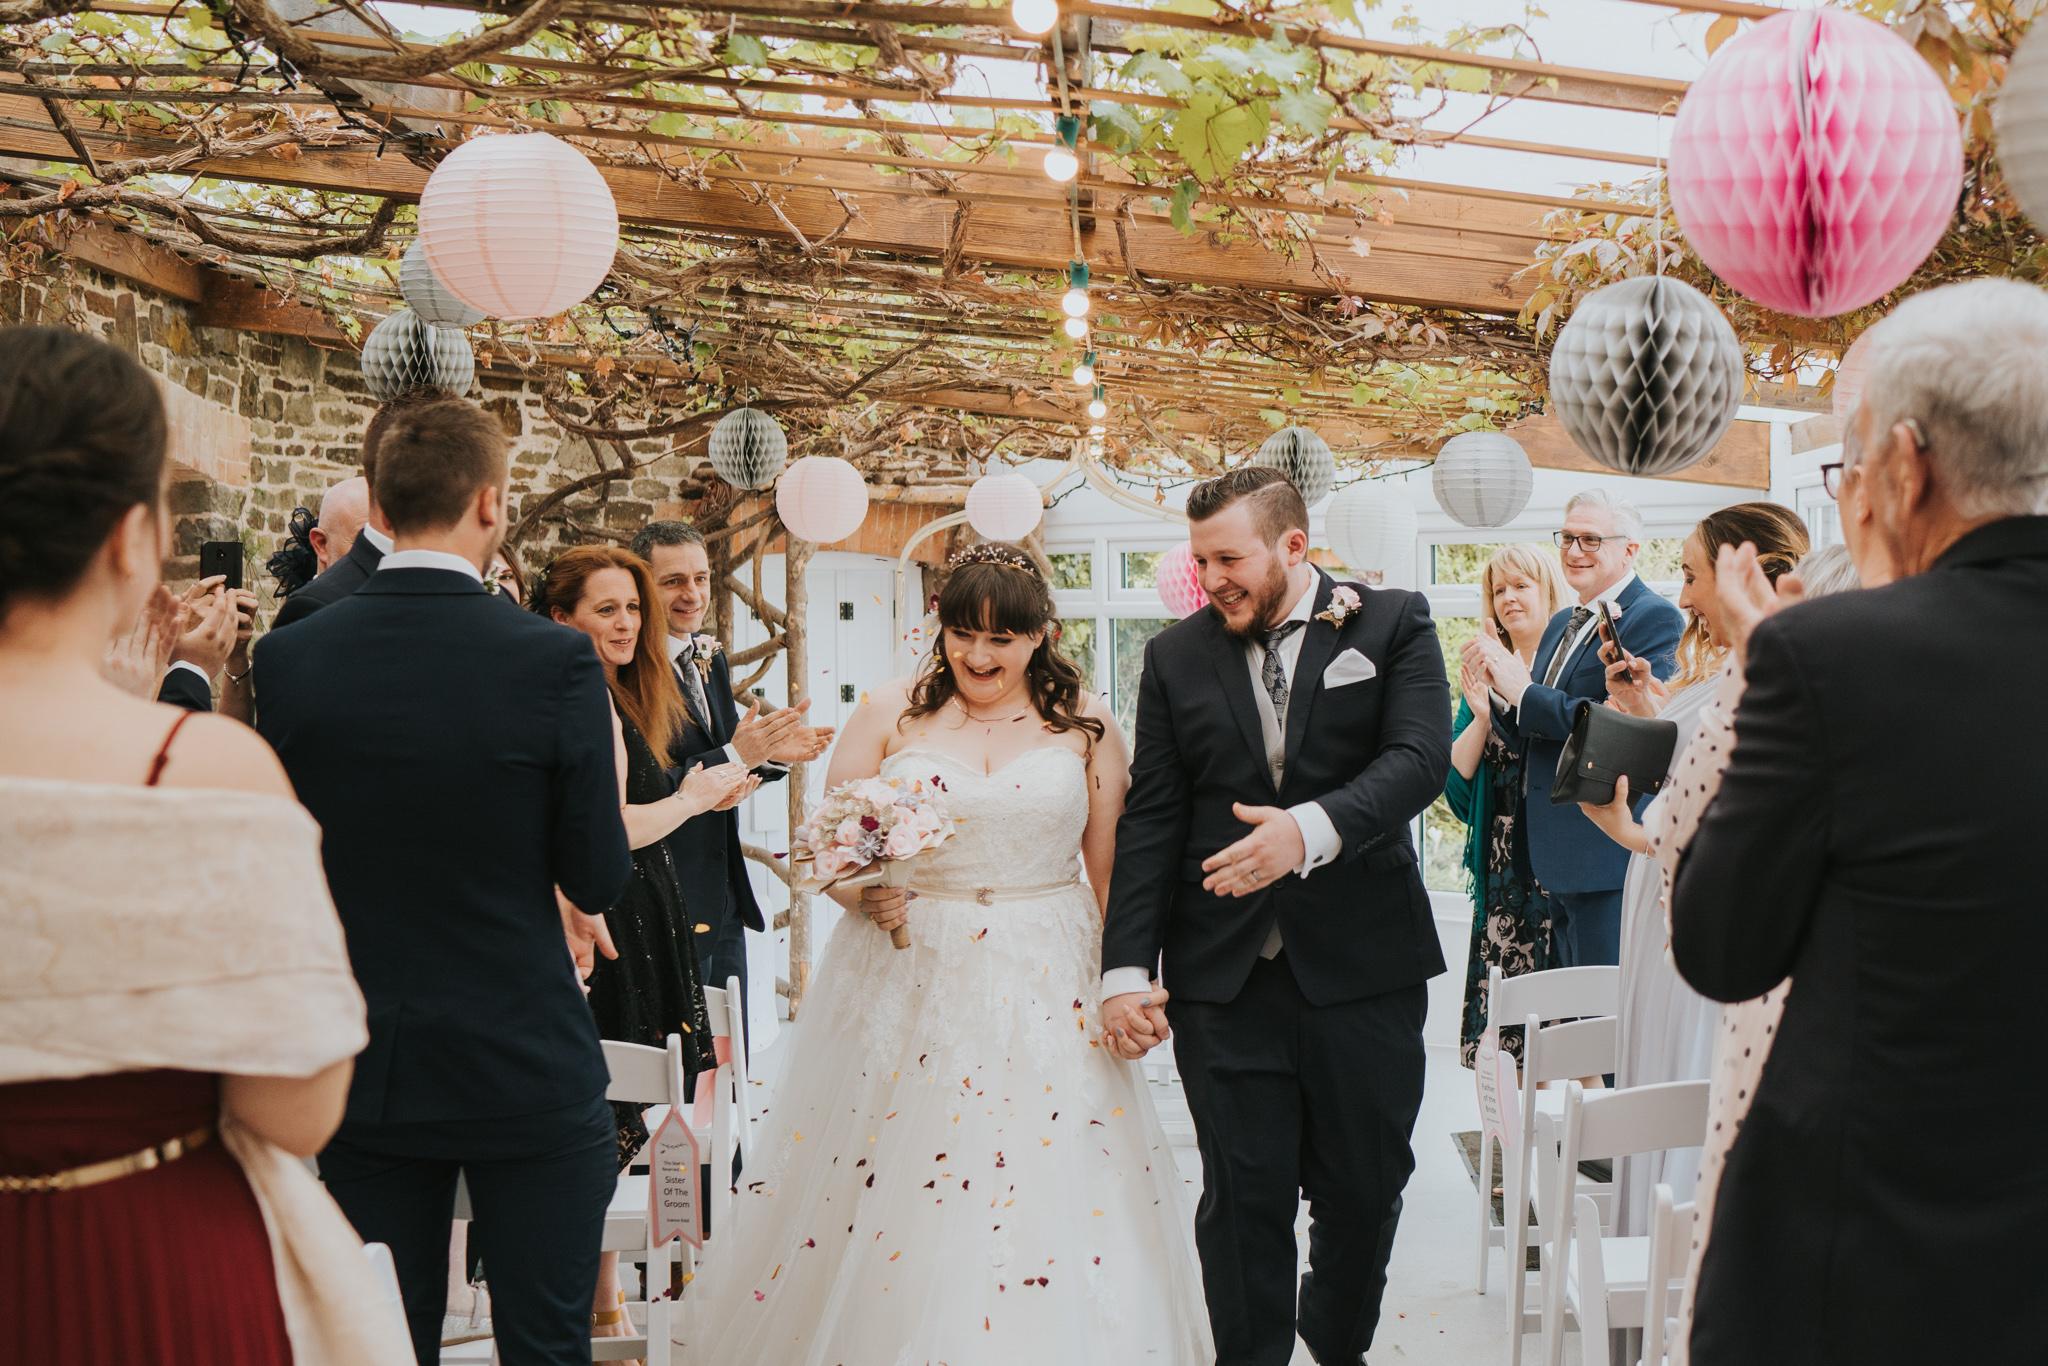 grace-sam-old-barn-clovelly-devon-wedding-photographer-grace-elizabeth-essex-suffolk-norfolk-wedding-photographer (67 of 132).jpg